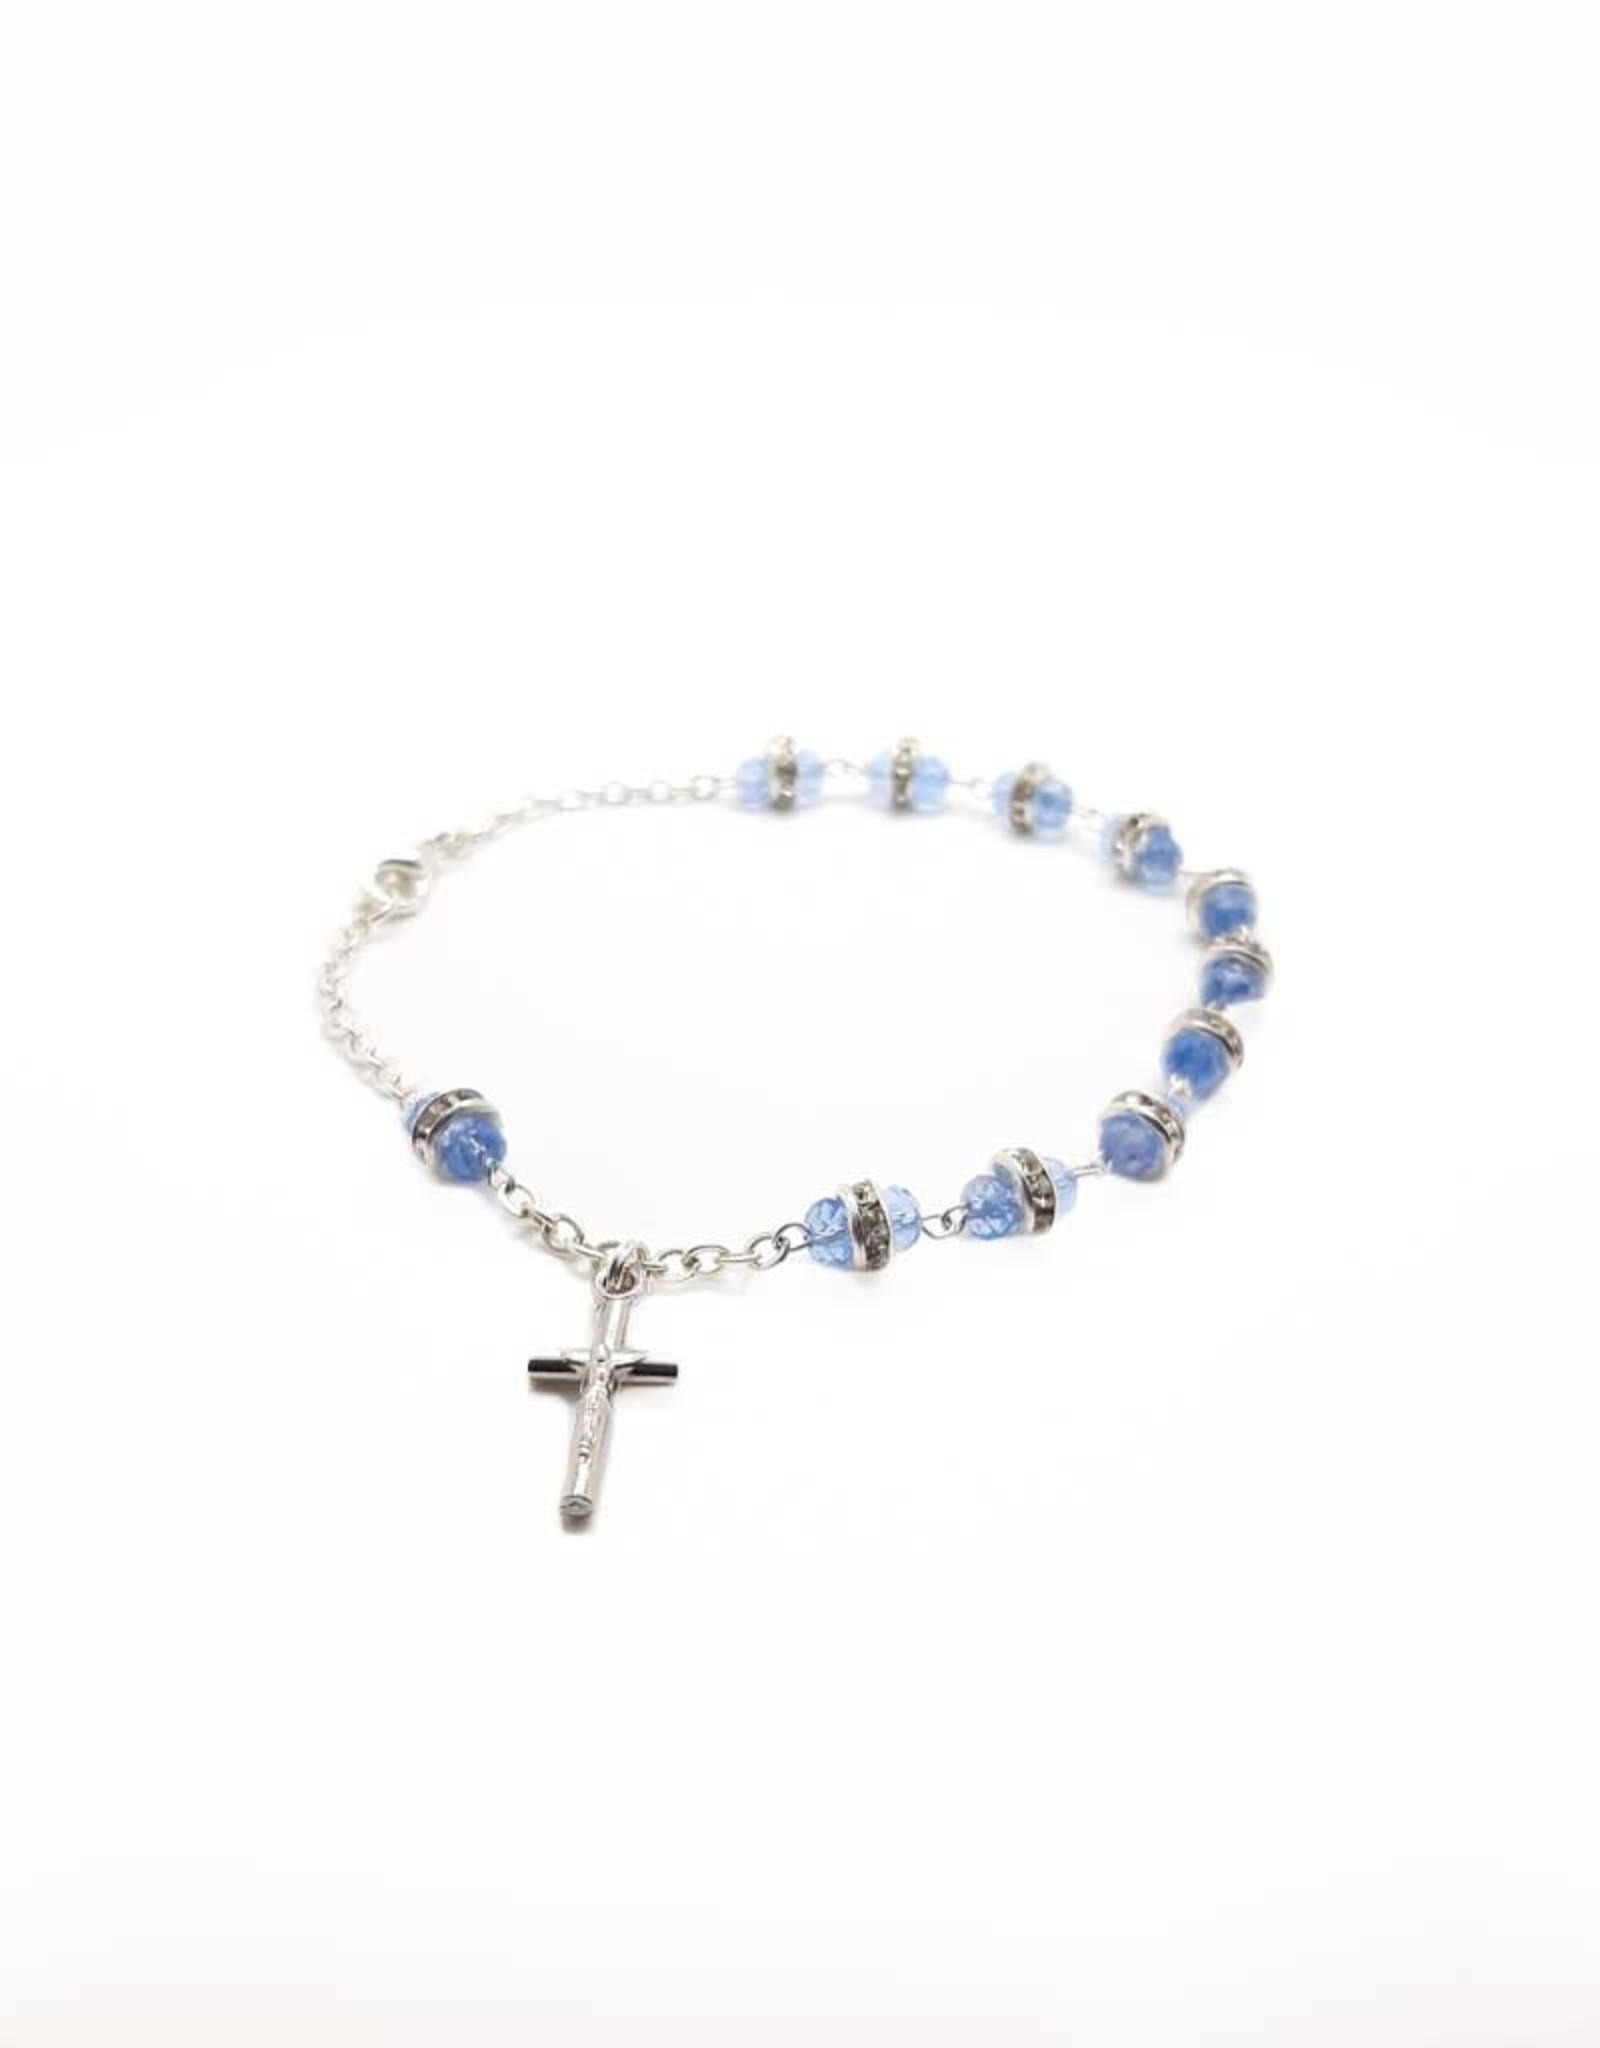 Light blue Swarovki crystal rosary bracelet